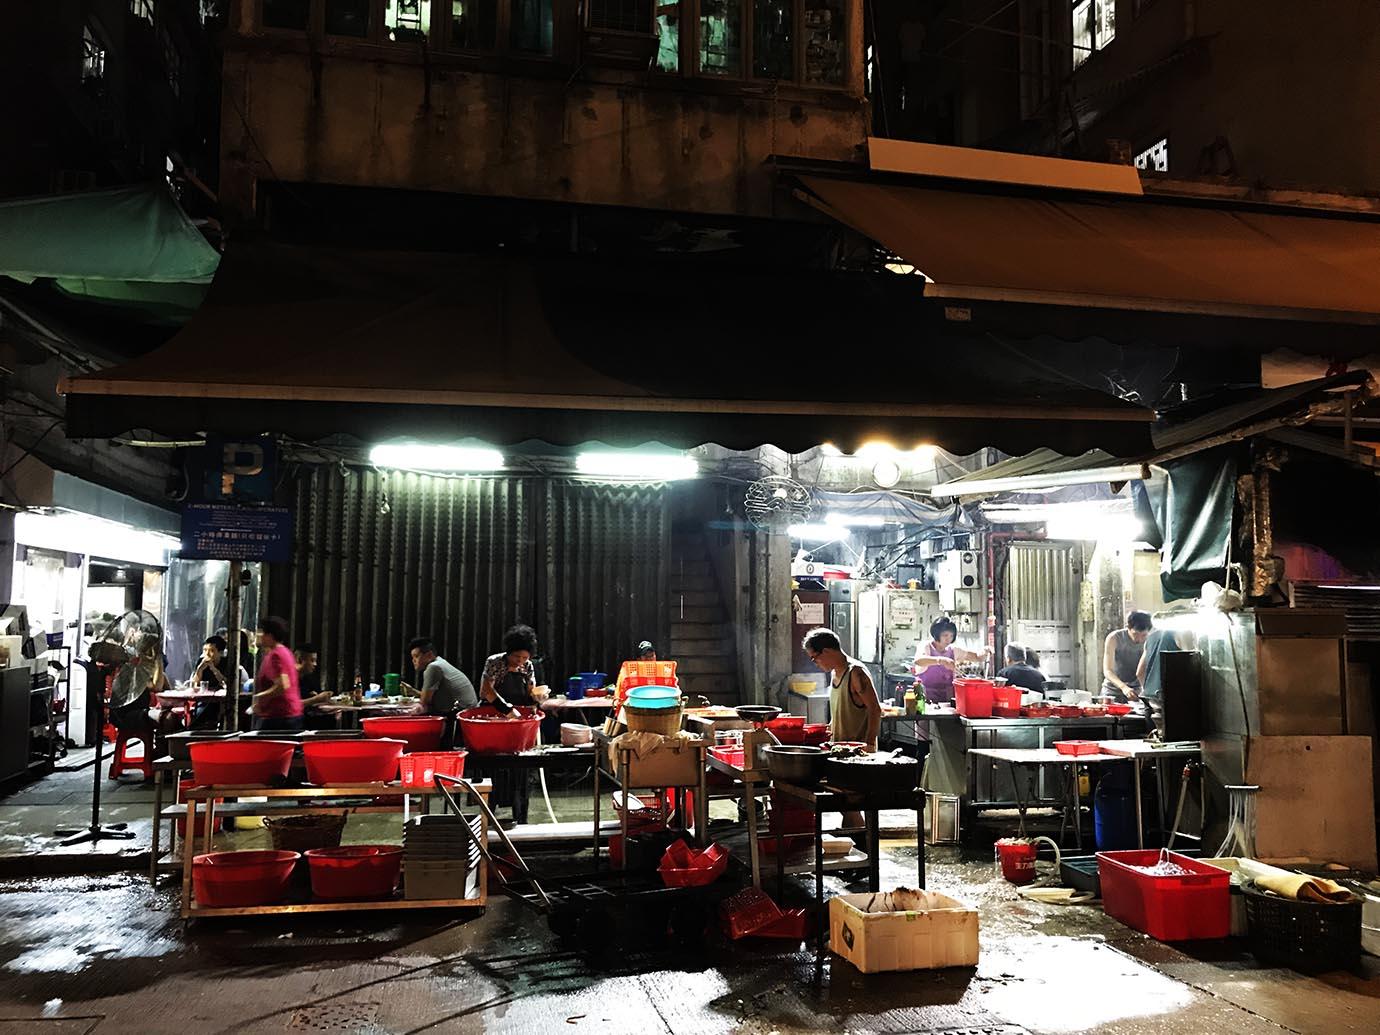 hongkong-sham-shui-po-yatai1